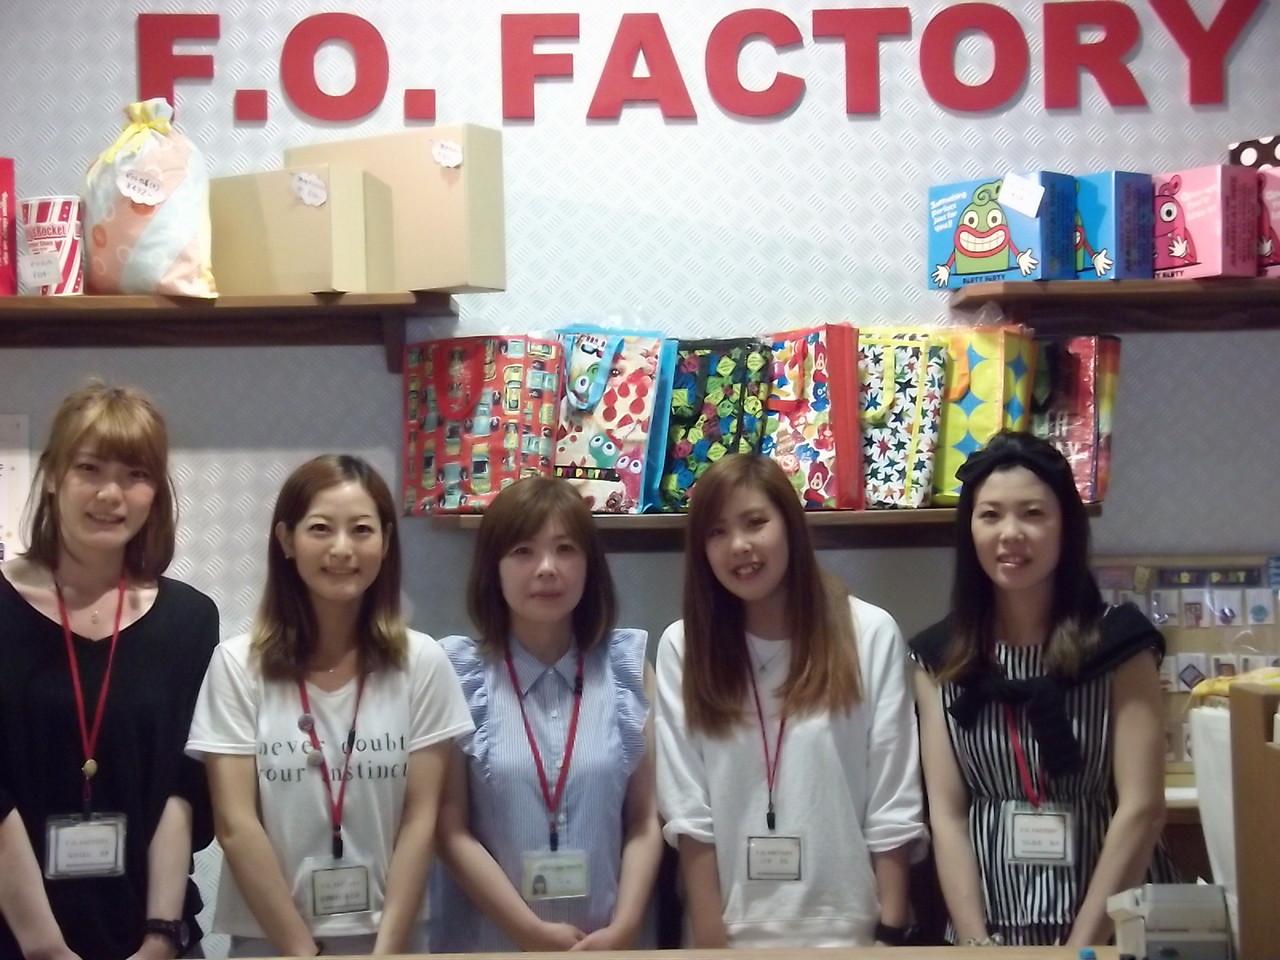 F.O.FACTORY 横浜ベイサイド店